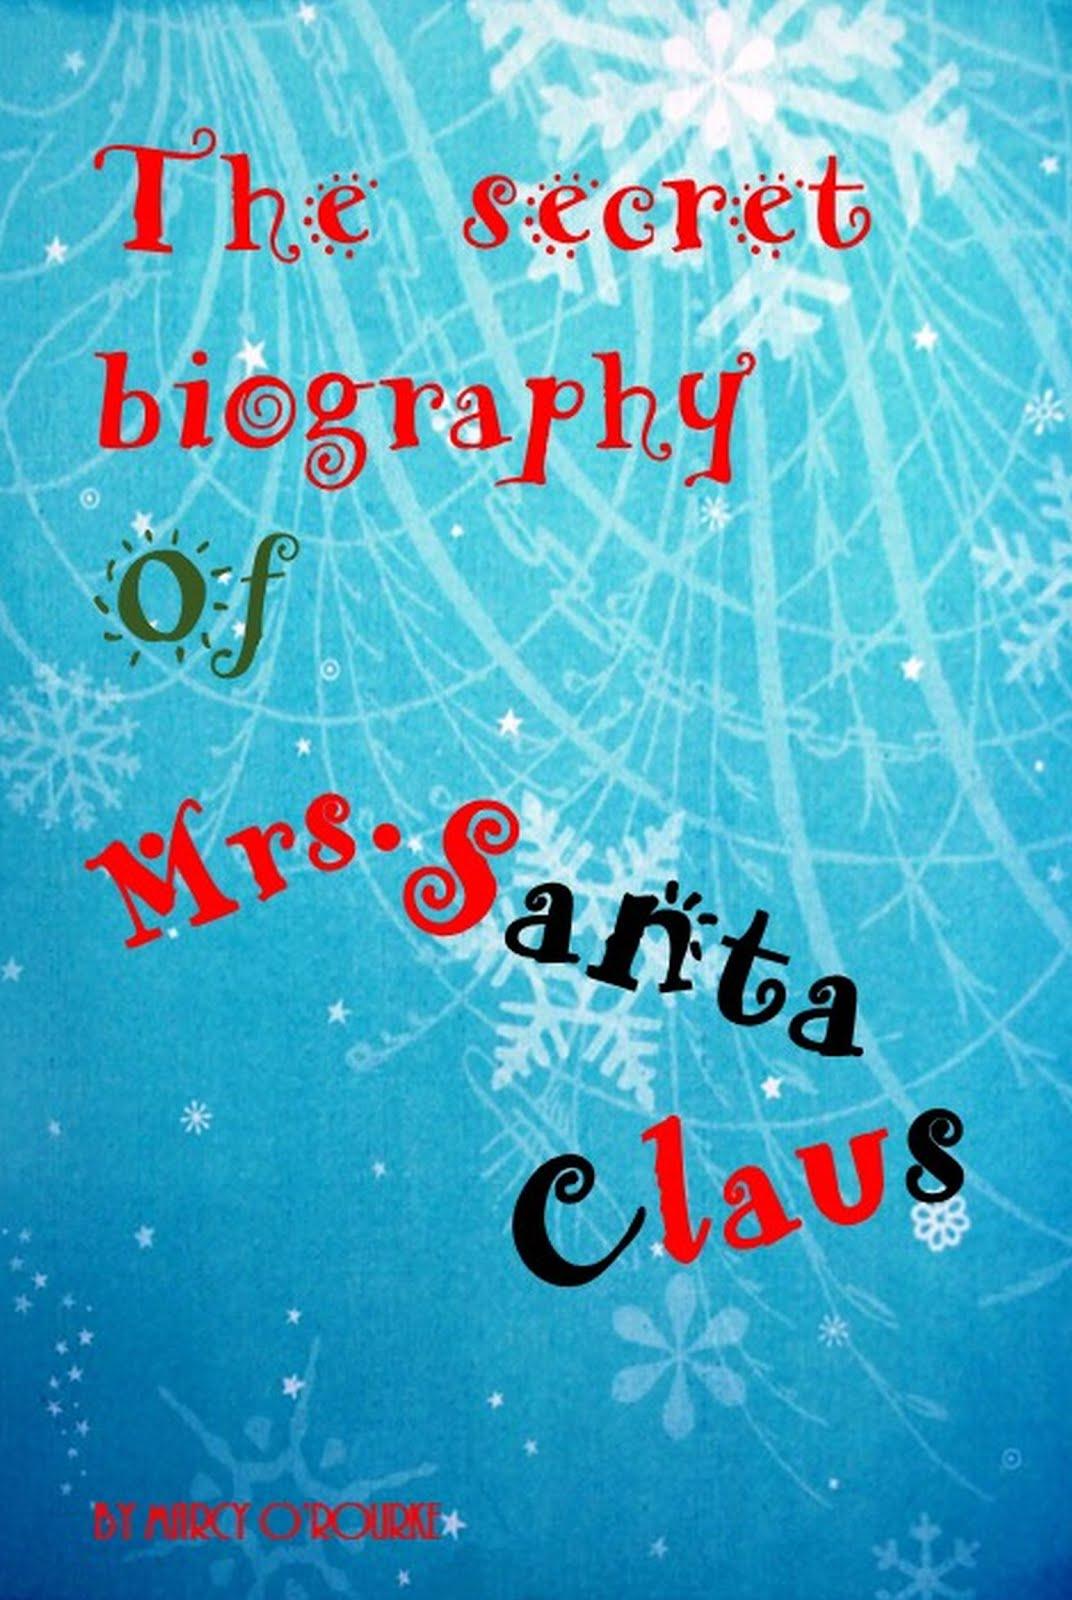 The Secret Biography of Mrs. Santa Claus